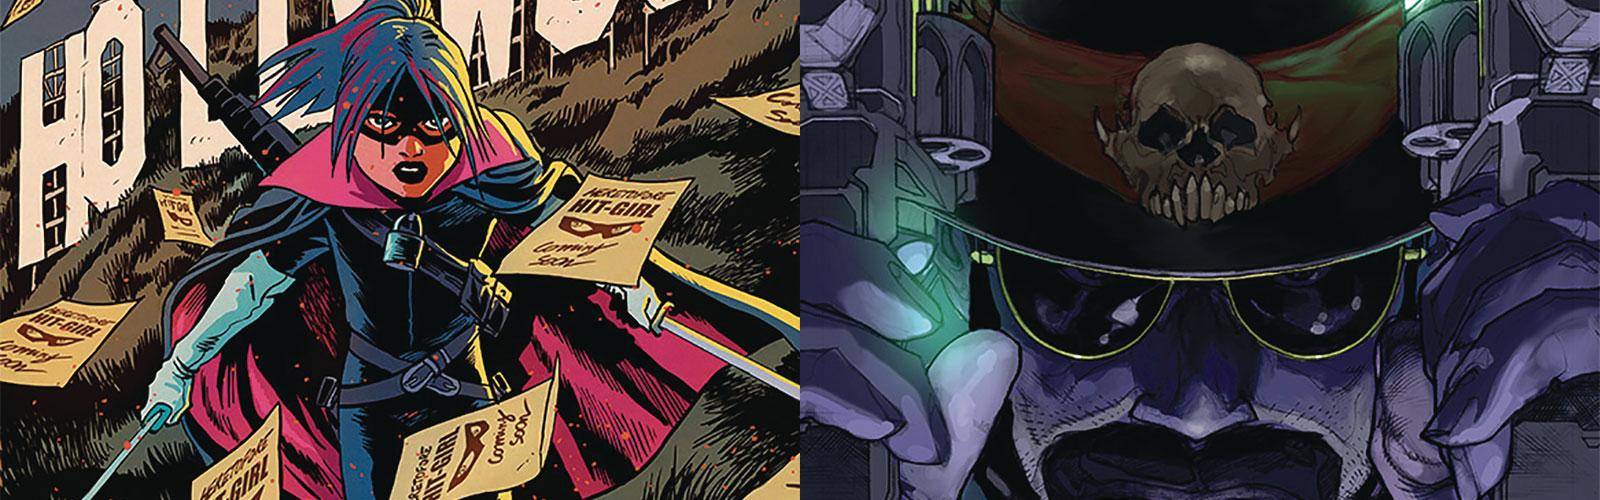 Solicitations: February 2019 – Image Comics